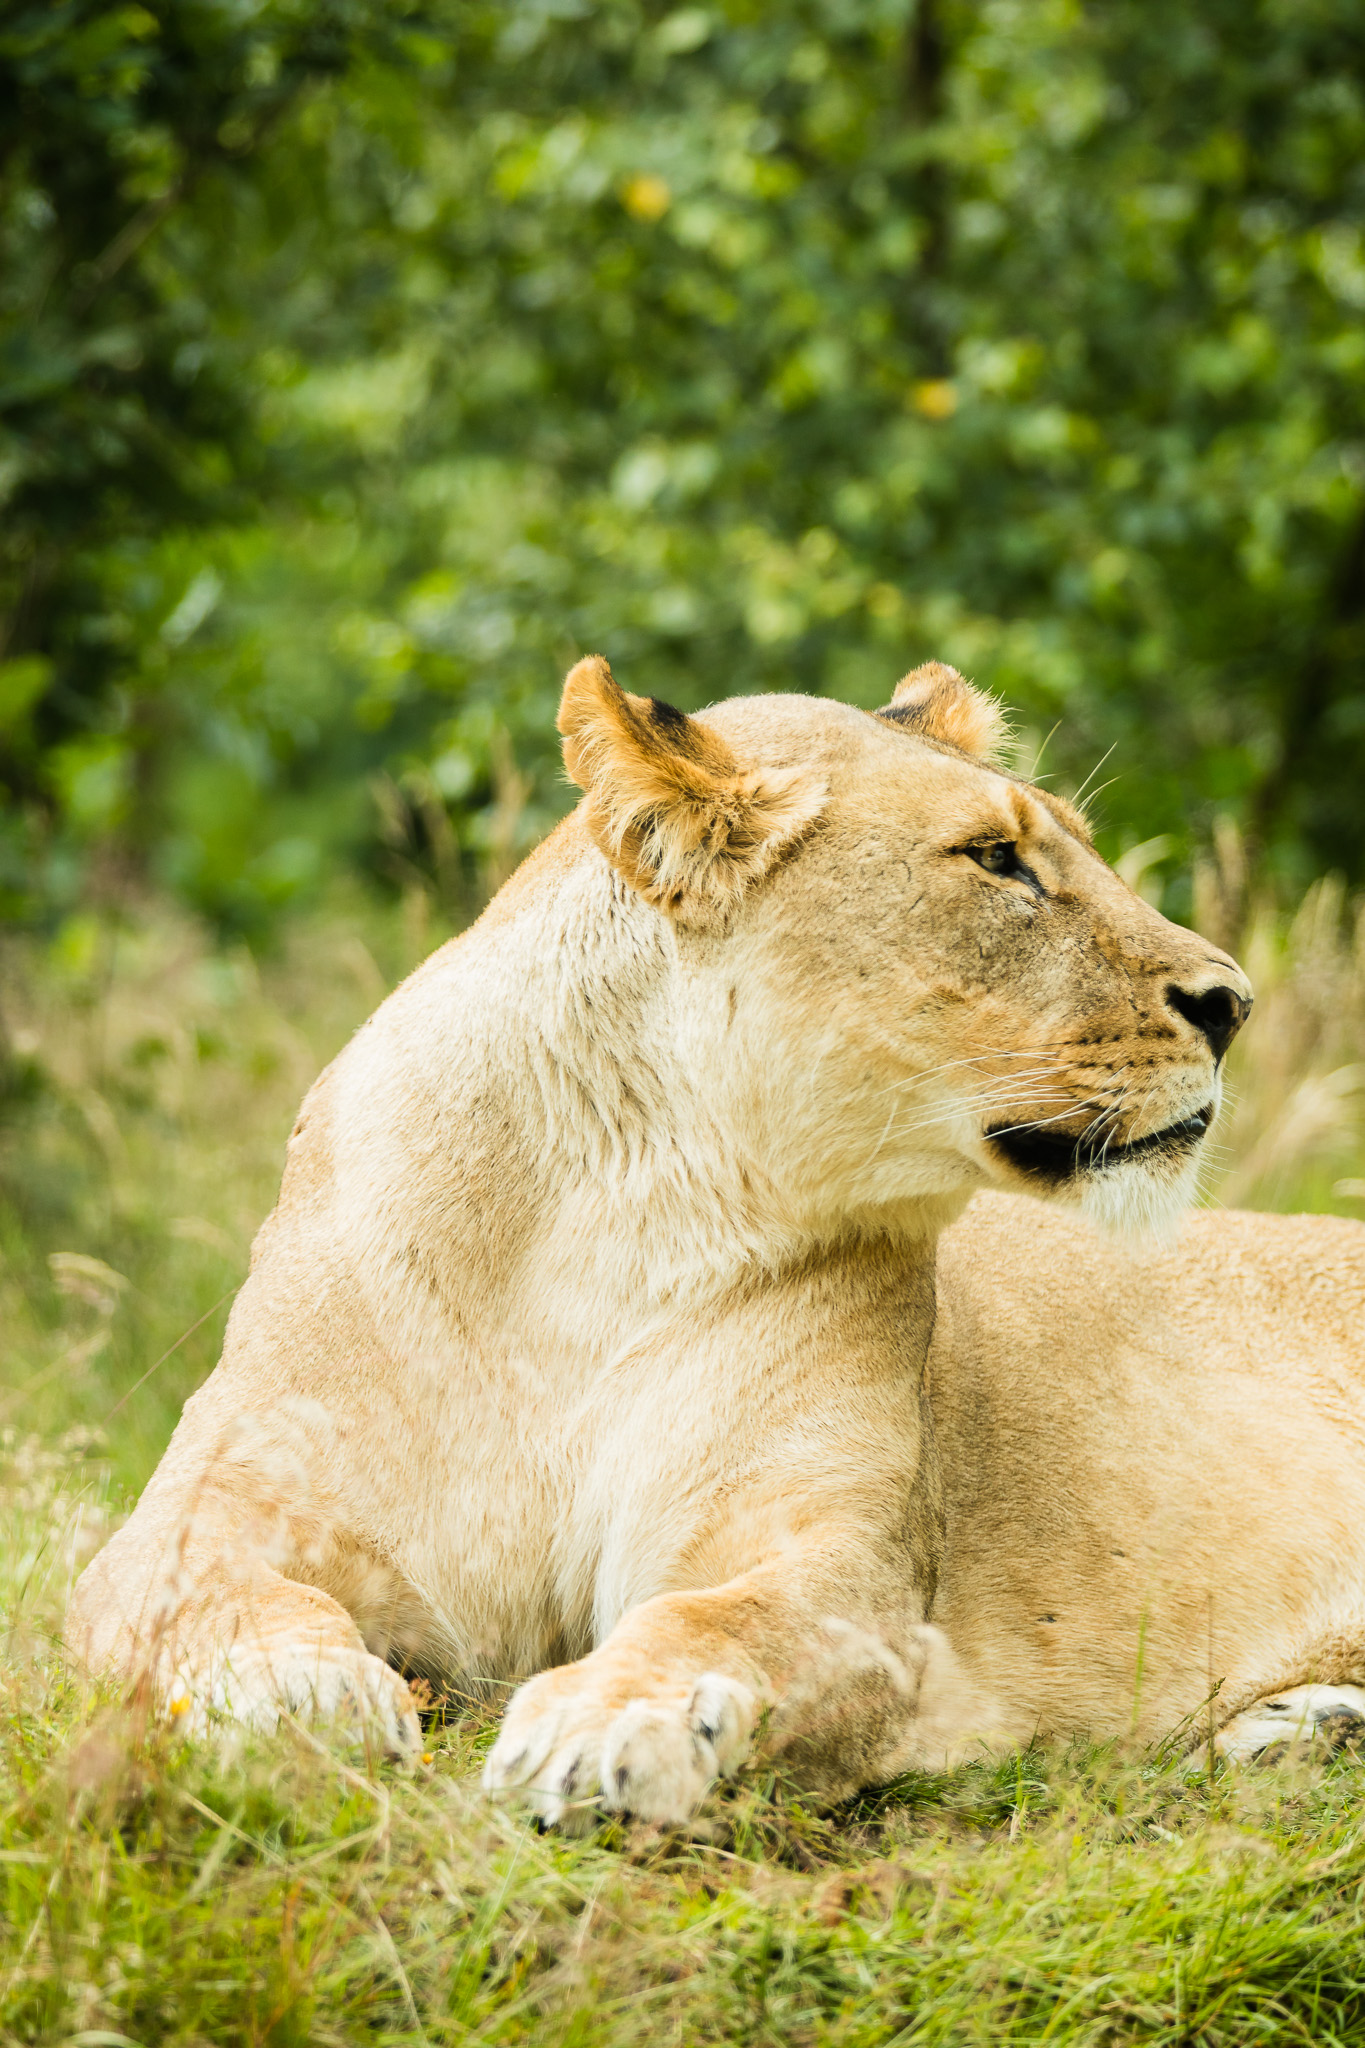 Givskud-Zoo-Safari-NorthernWorkshops-16.jpg